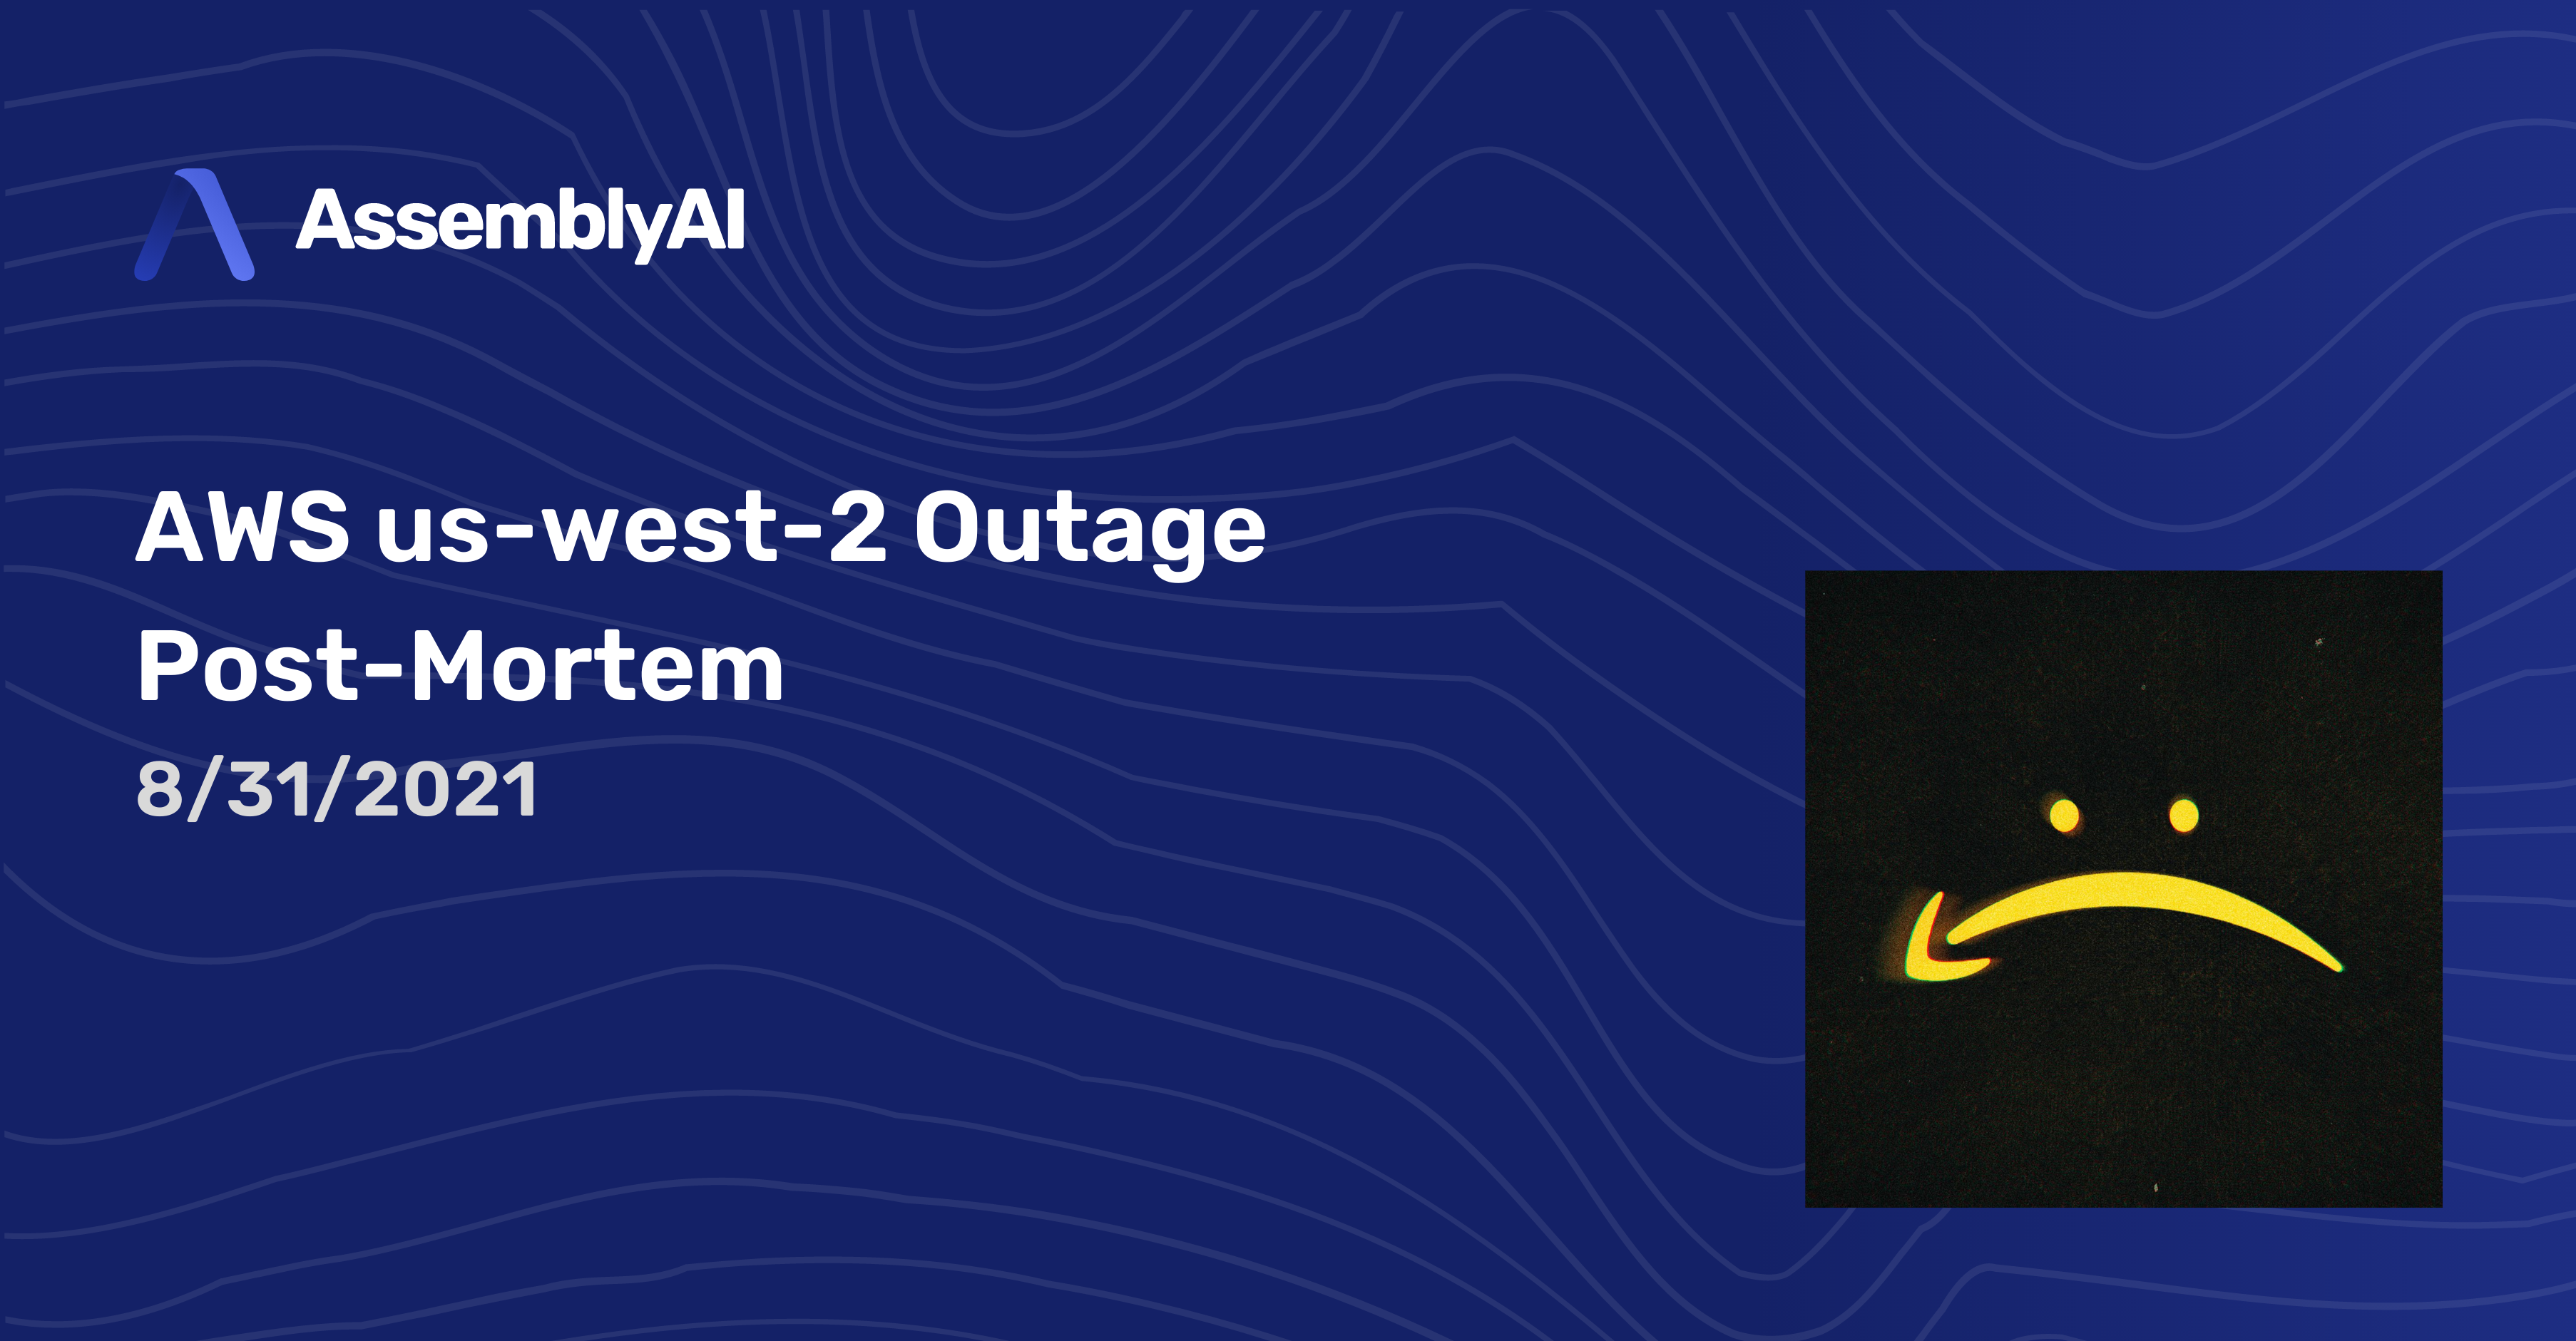 8/31/2021 AWS Outage Post-Mortem